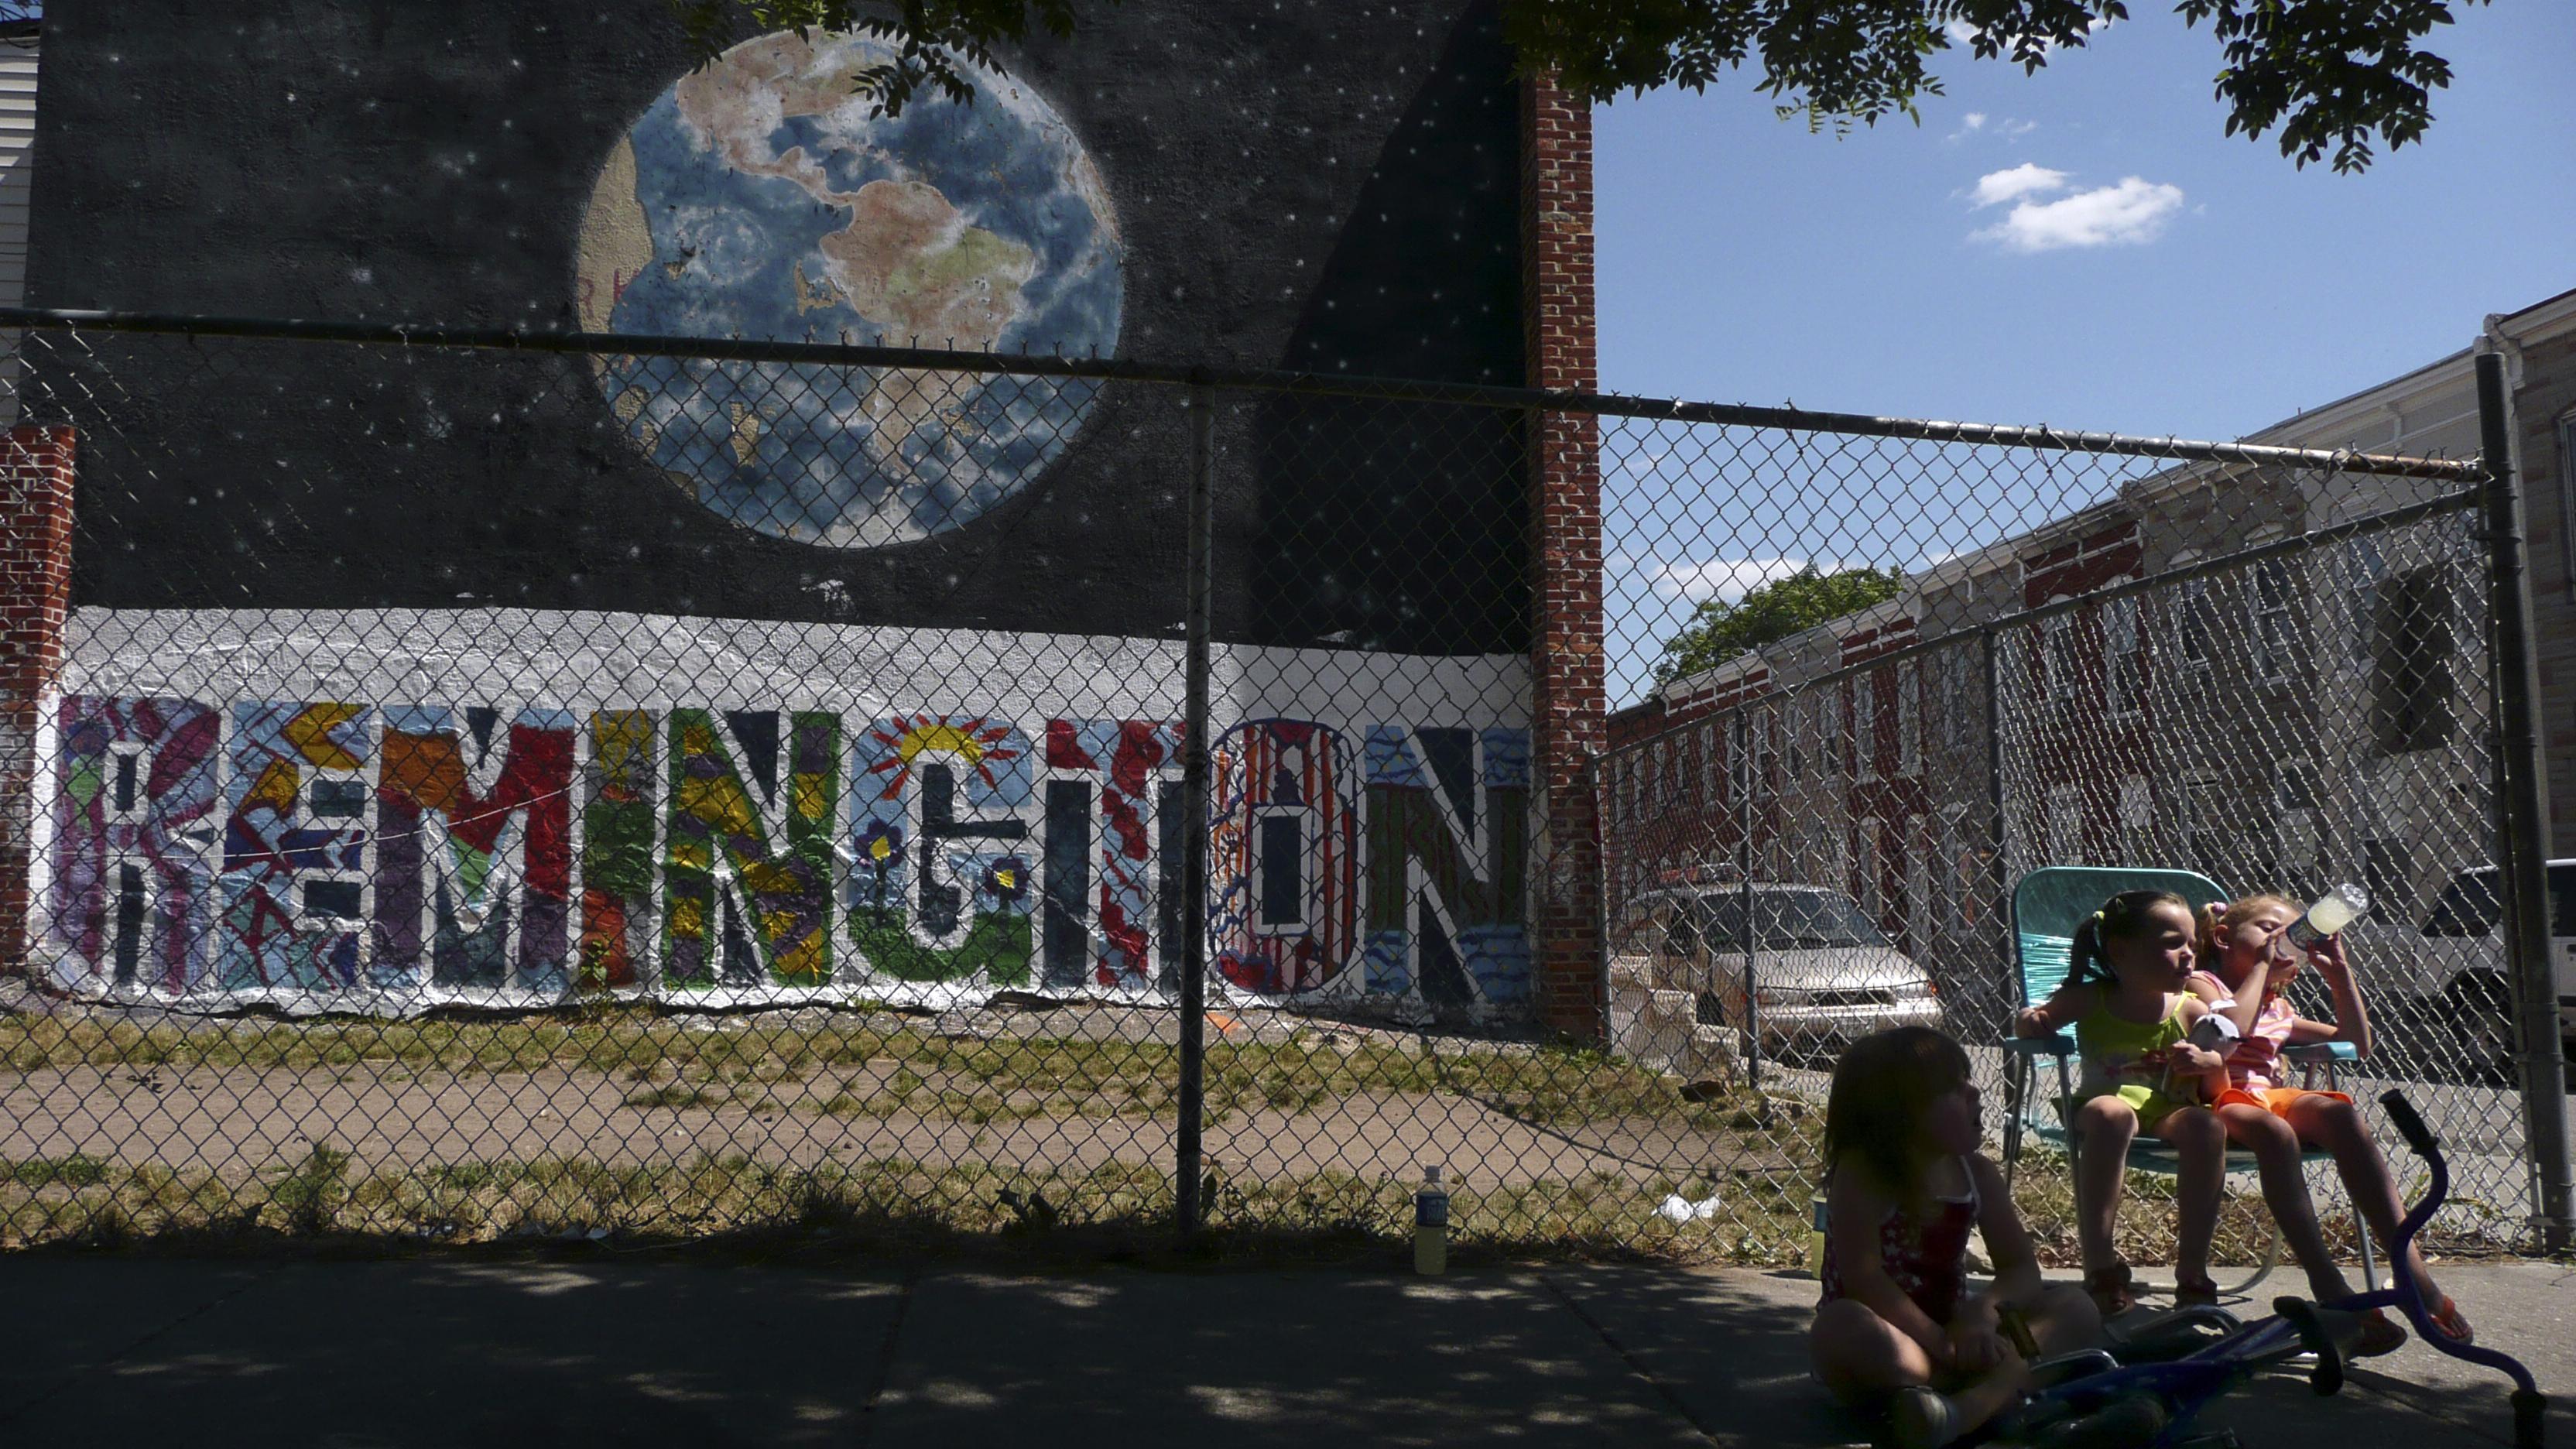 Remington: Exploring Baltimore's neighborhoods